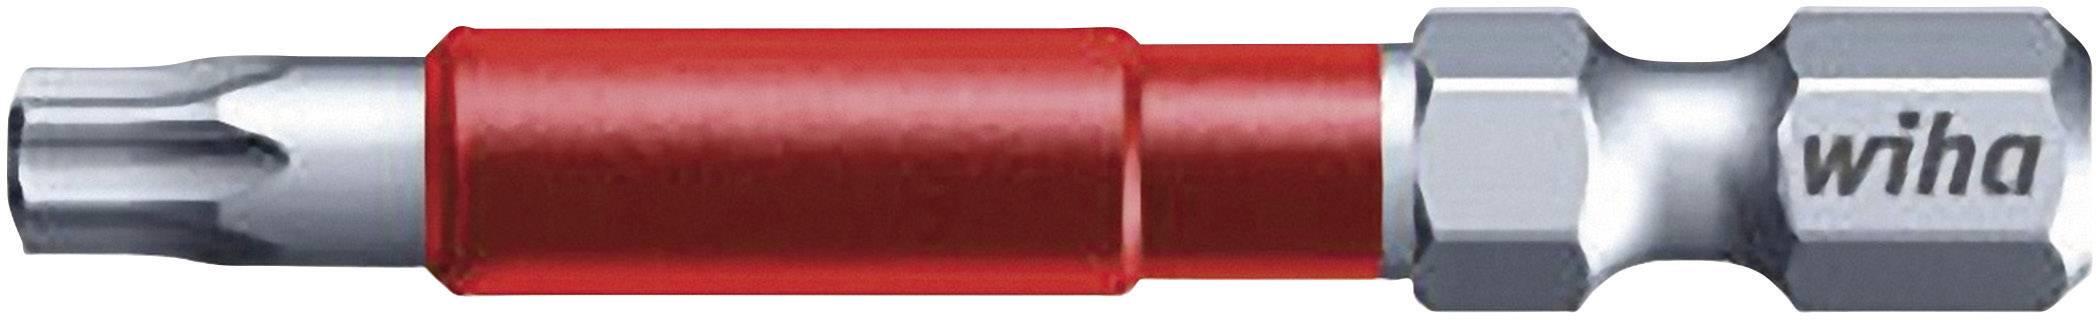 Bit Torx Wiha MaxxTor 7045 M9T 36841, 49 mm, nástrojová oceľ, legované, tvrdené, 5 ks